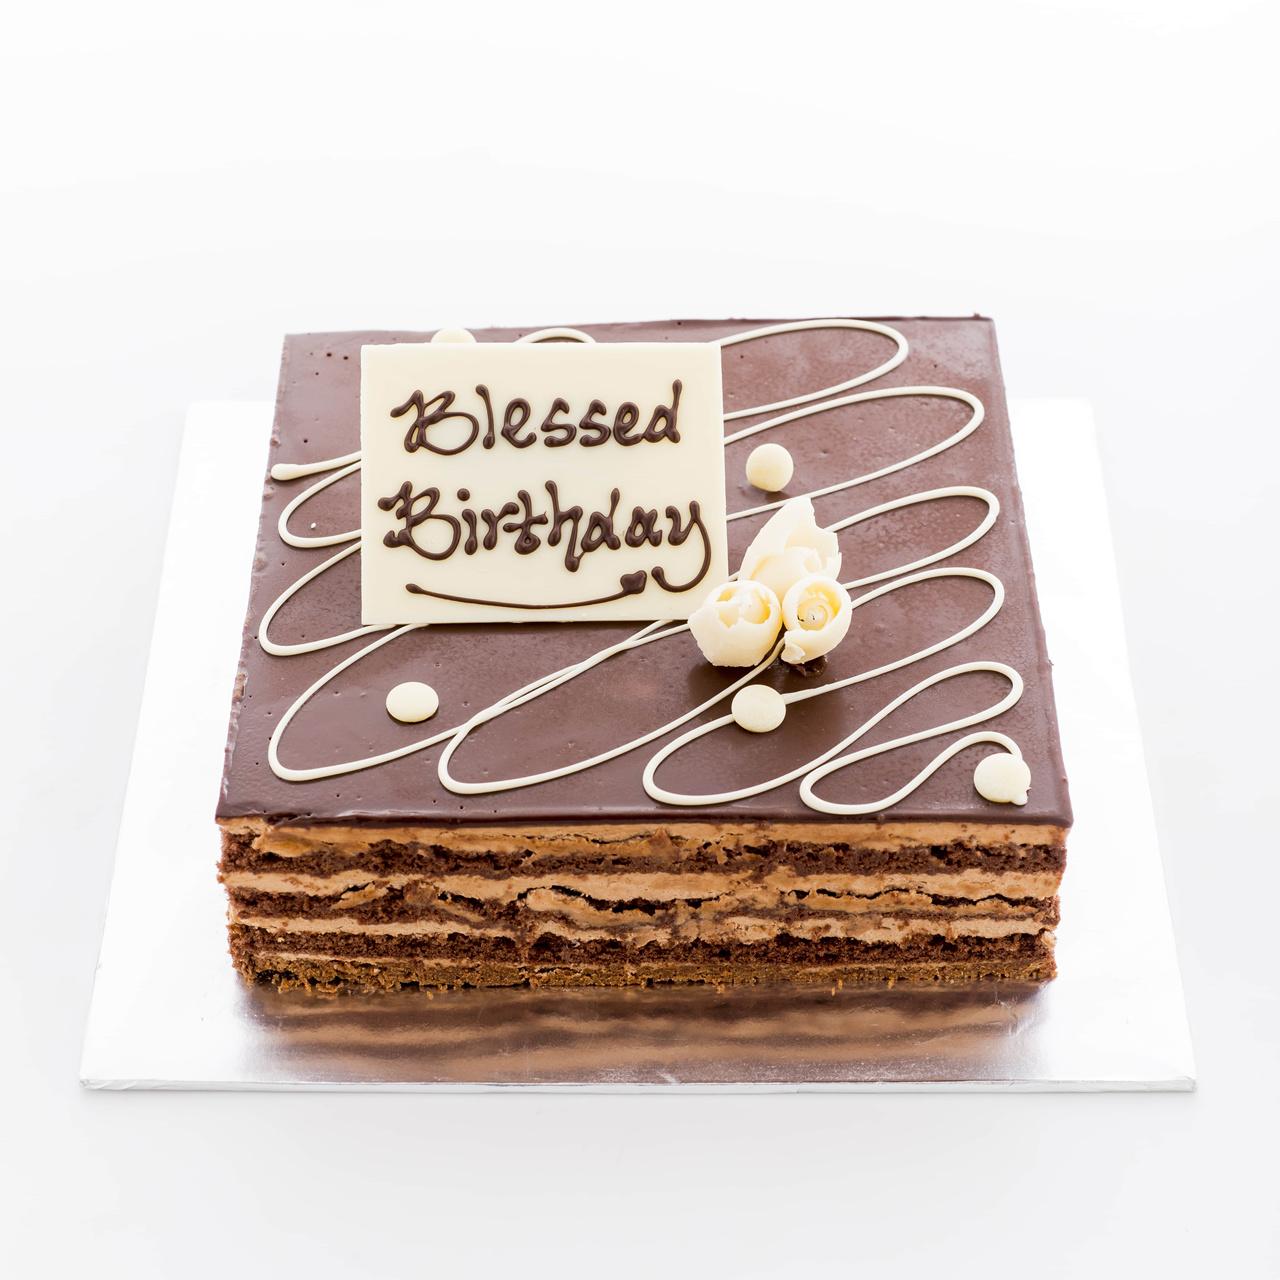 Hazelnut Chocolate Cake Wording